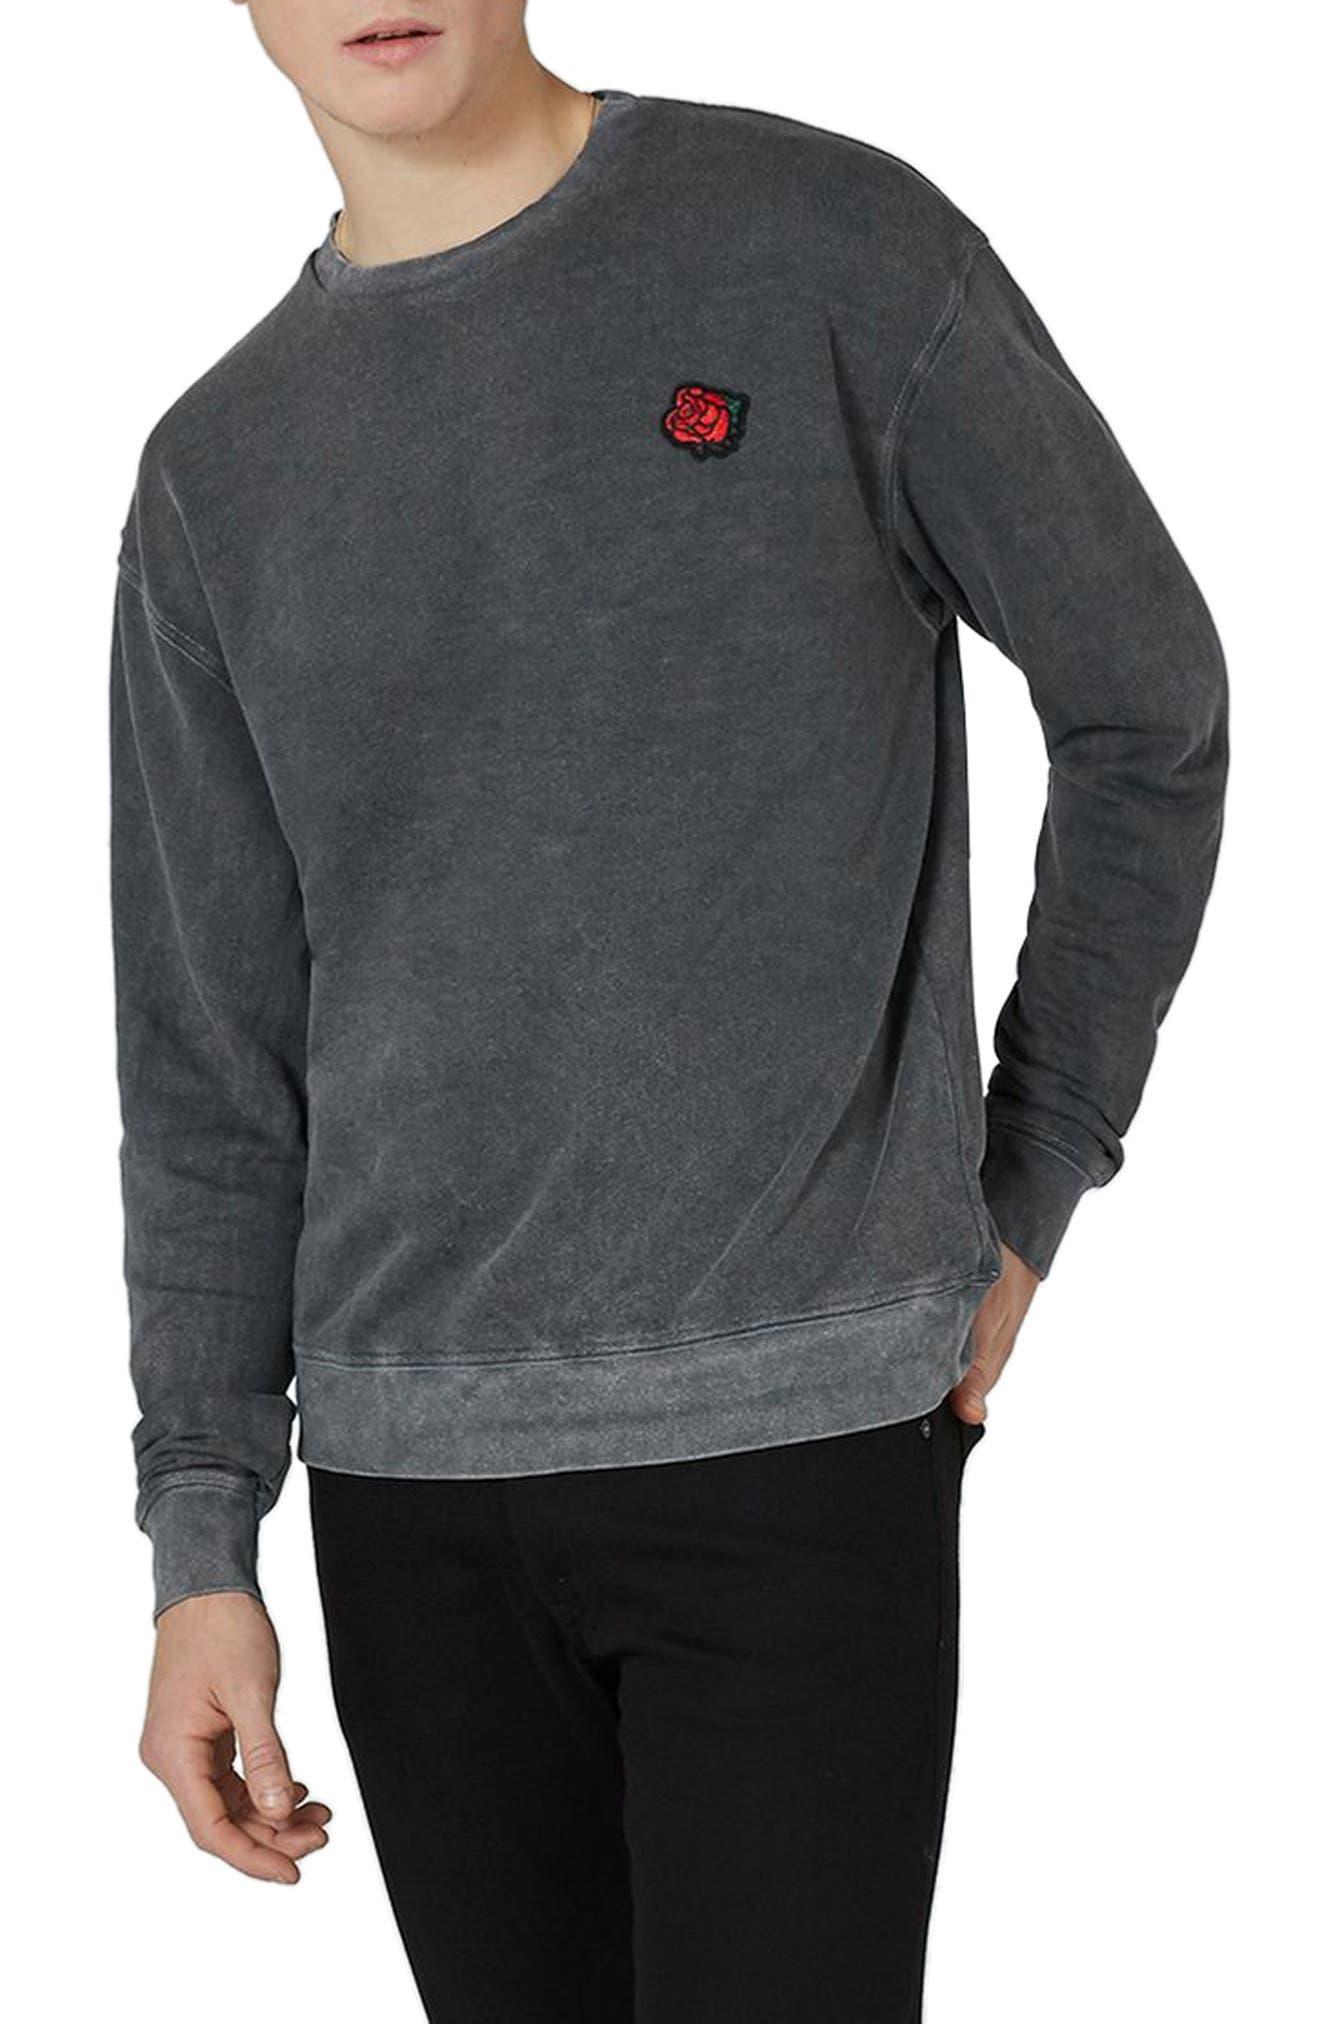 Topman Percy Rose Embroidered Sweatshirt